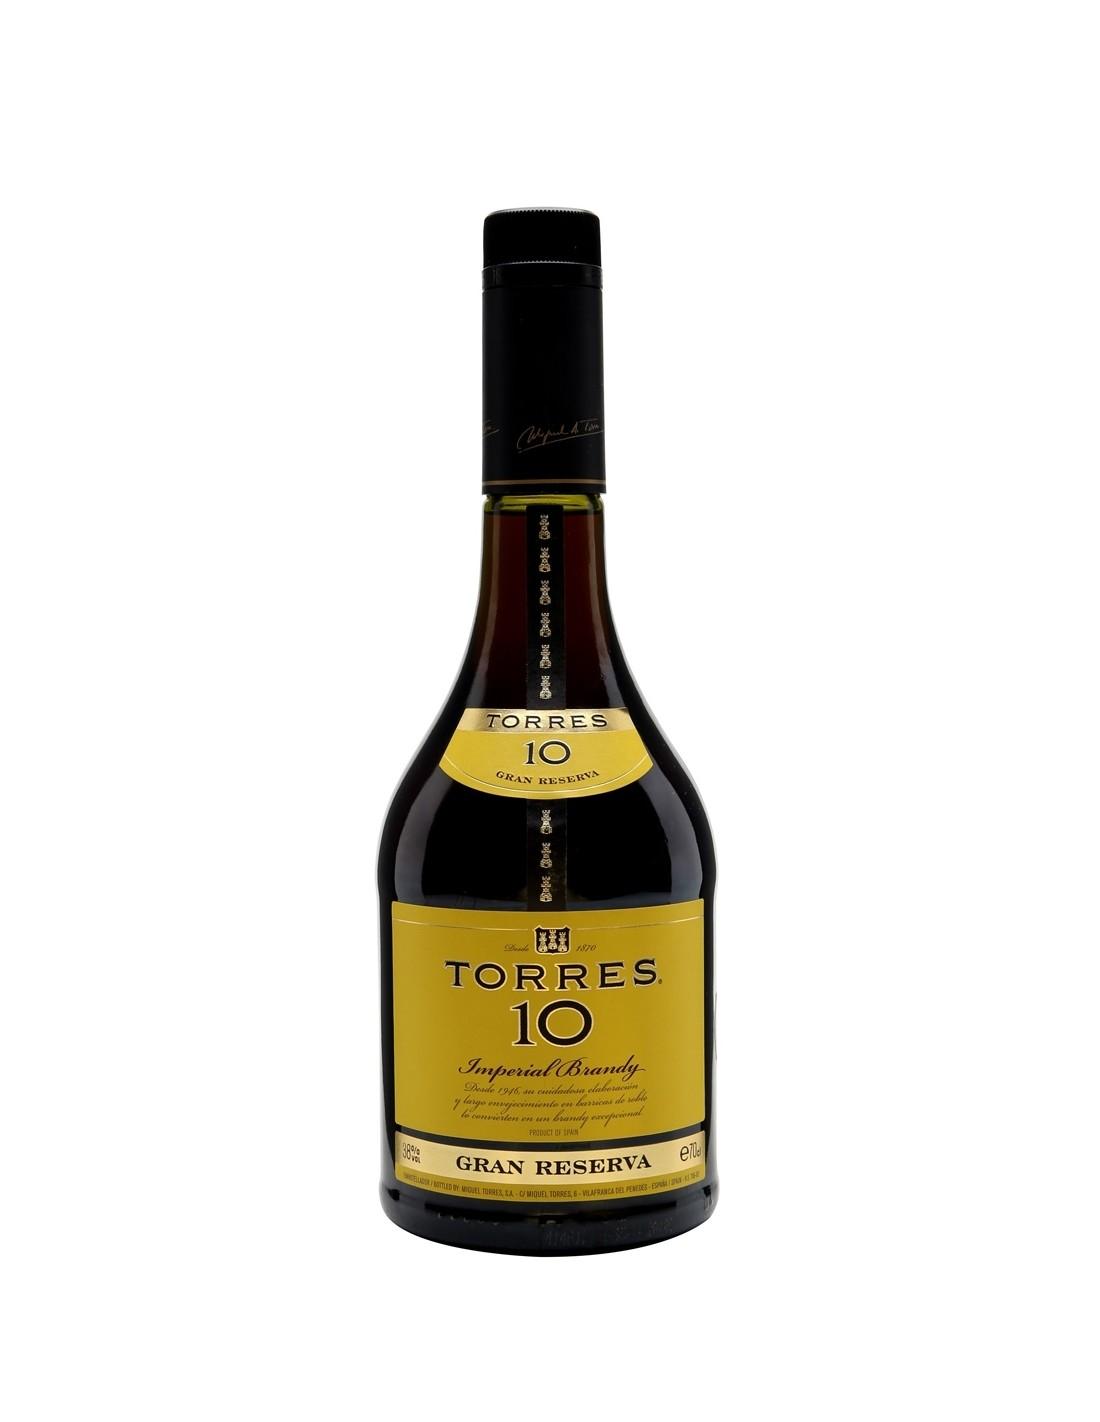 Coniac Brandy Torres 10 Gran Reserva, 38% alc., 0.7L, 10 ani, Spania